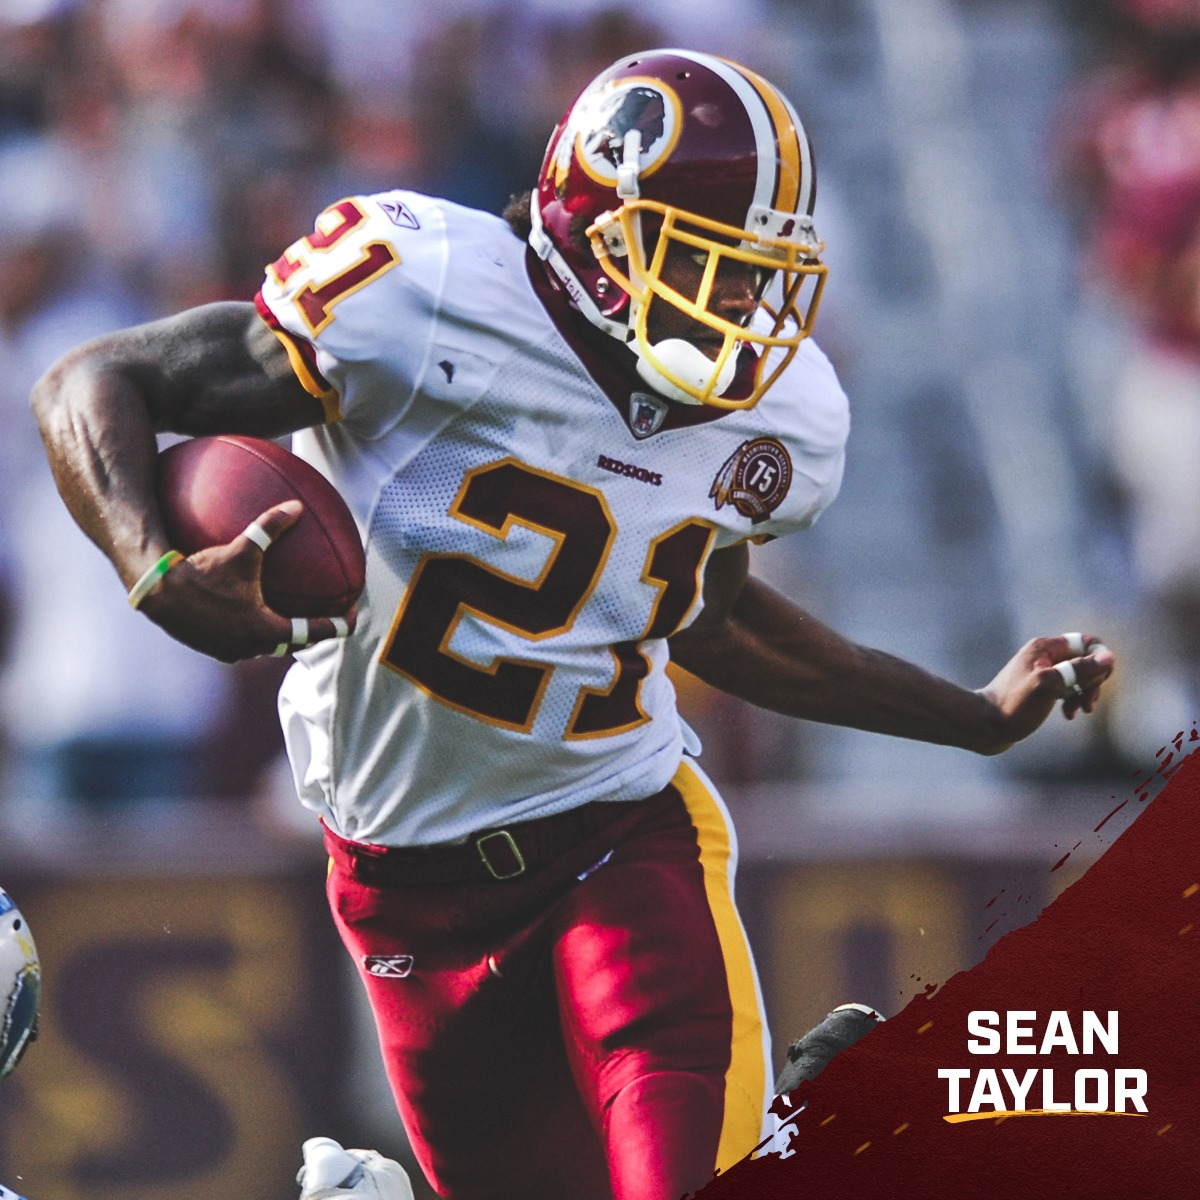 Sean Taylor Tribute